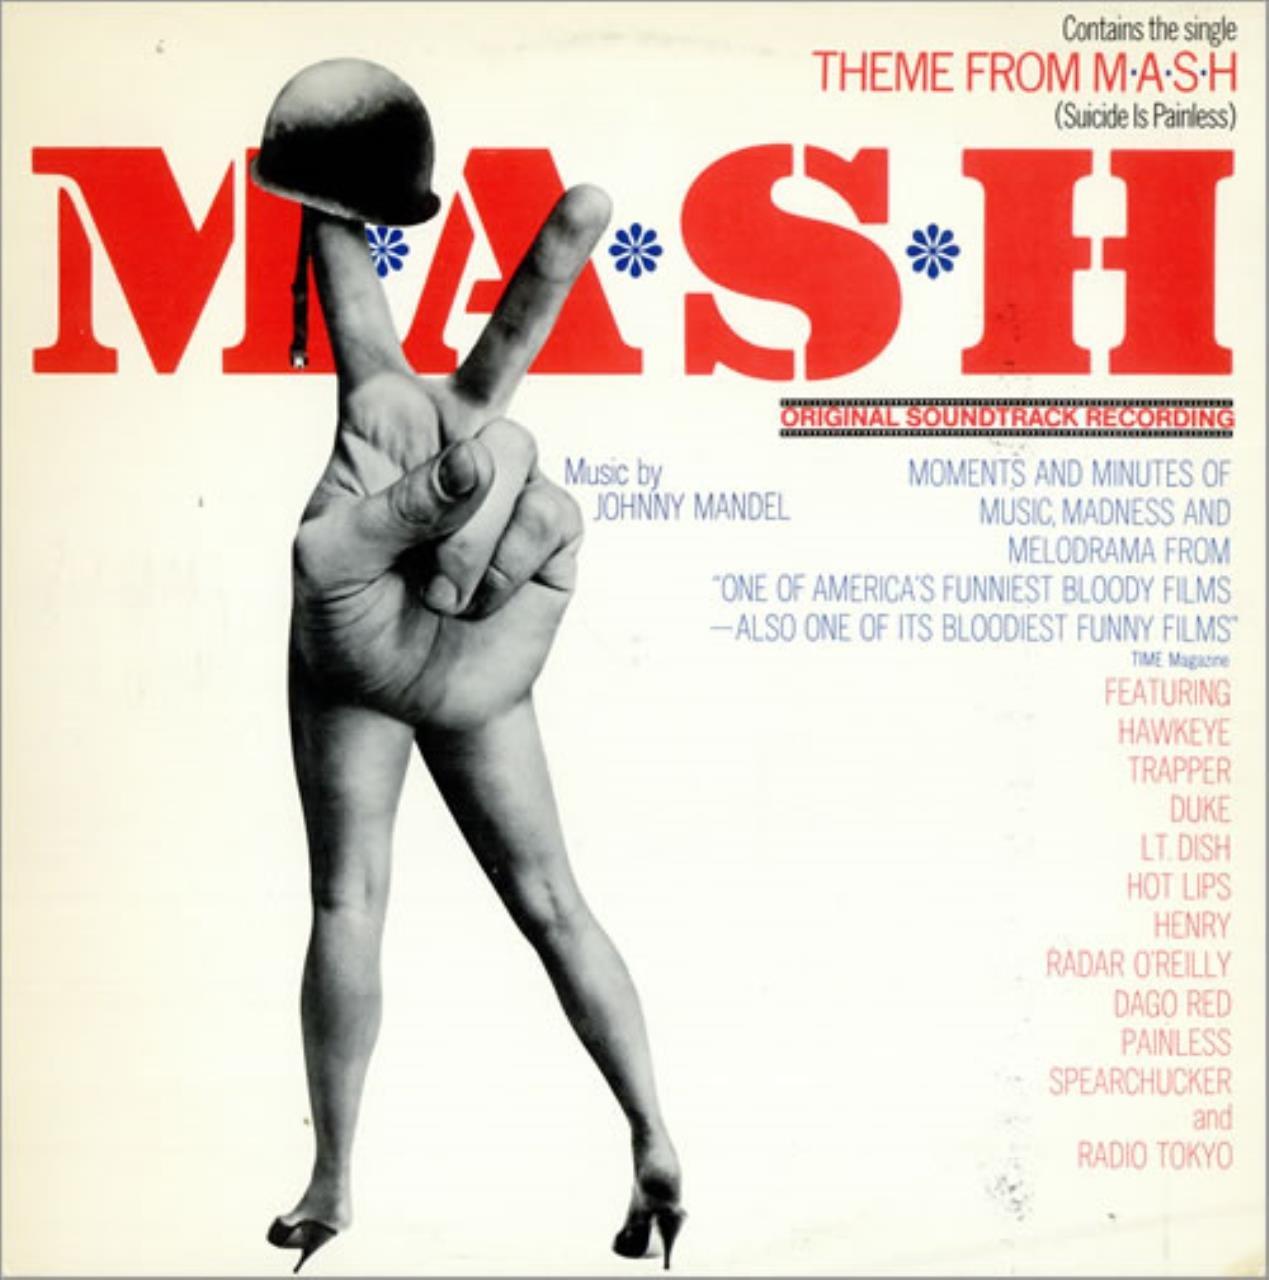 Johnny Mandel - M.A.S.H Soundtrack - Amazon.com Music